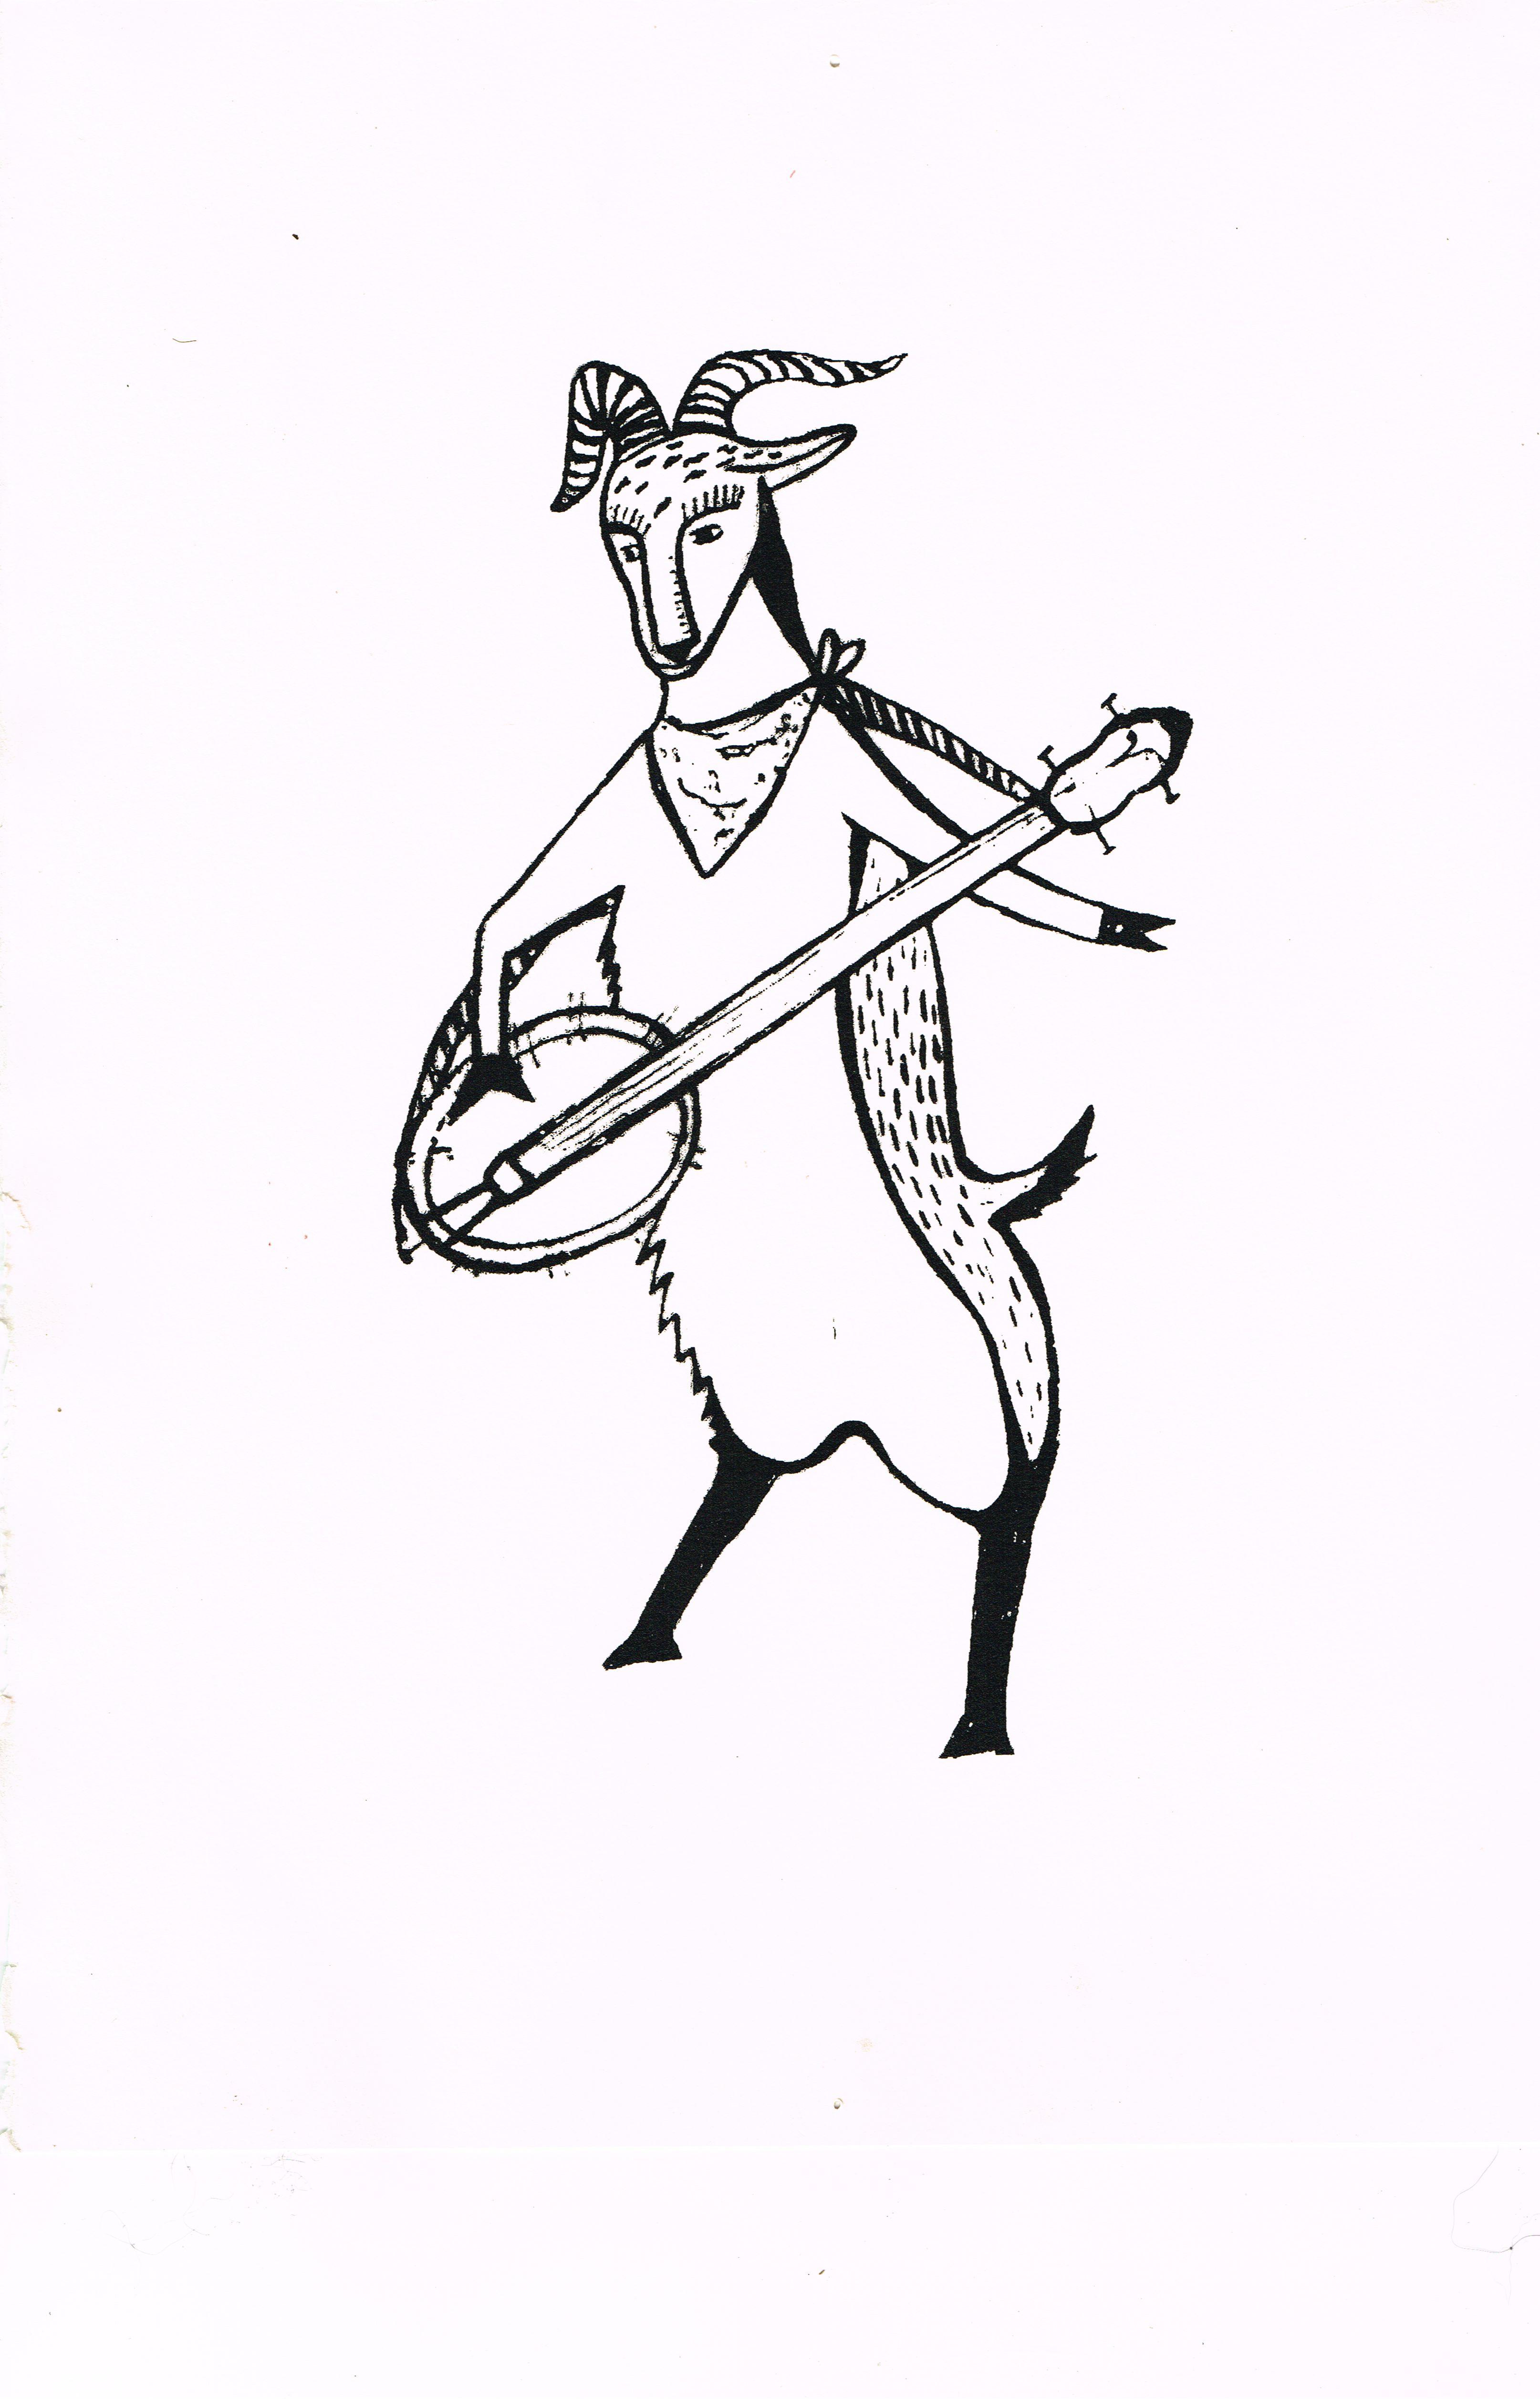 Goat-and-banjo.jpg